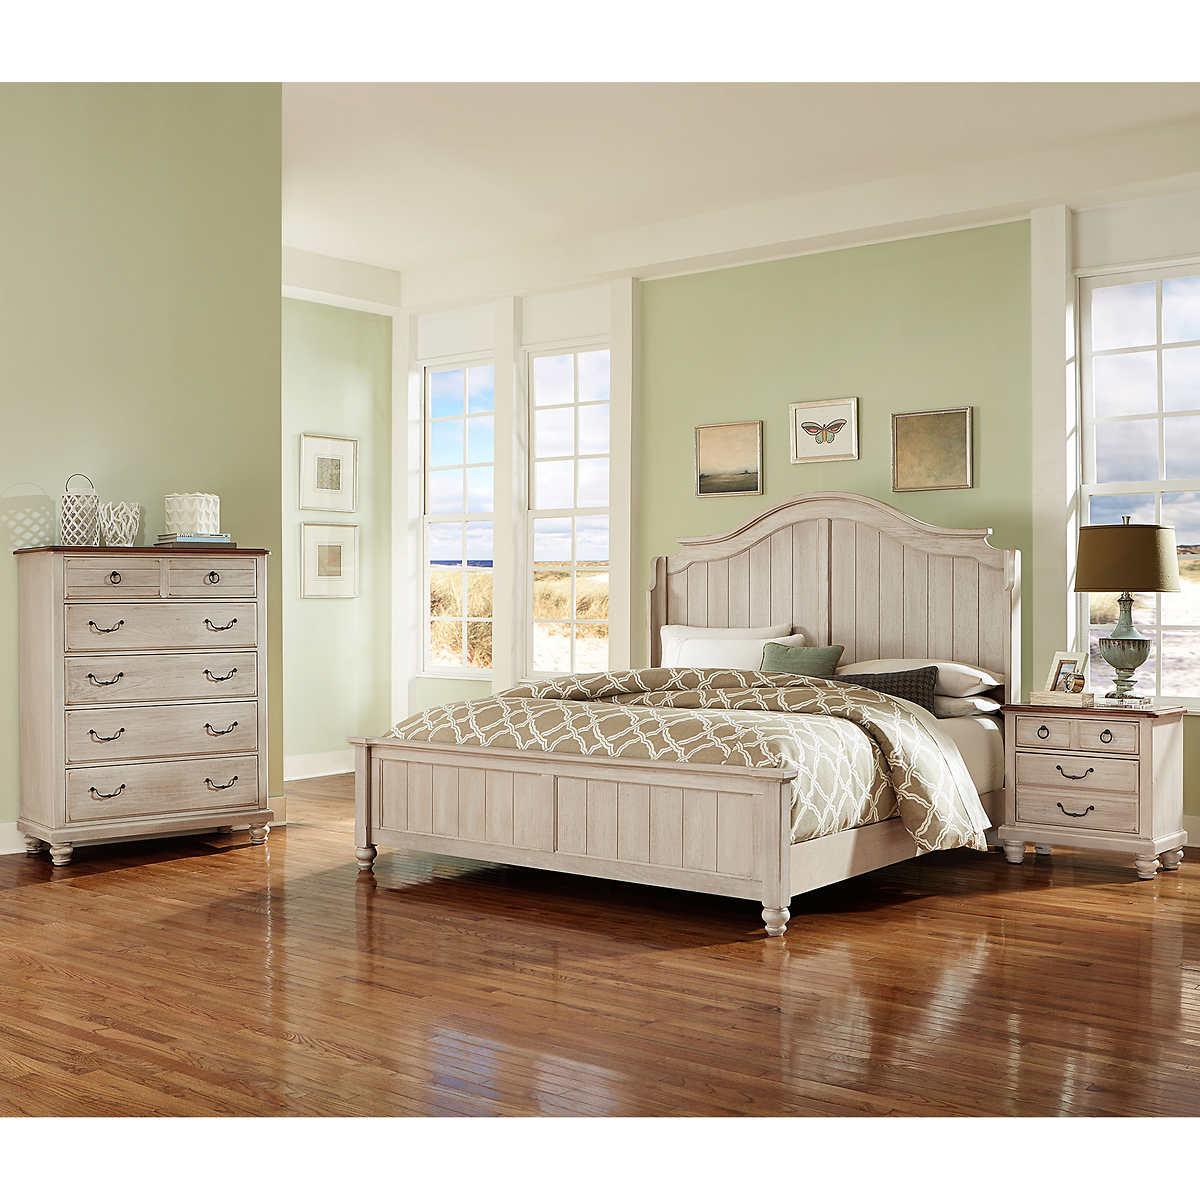 Savannah 4-piece King Bedroom Set